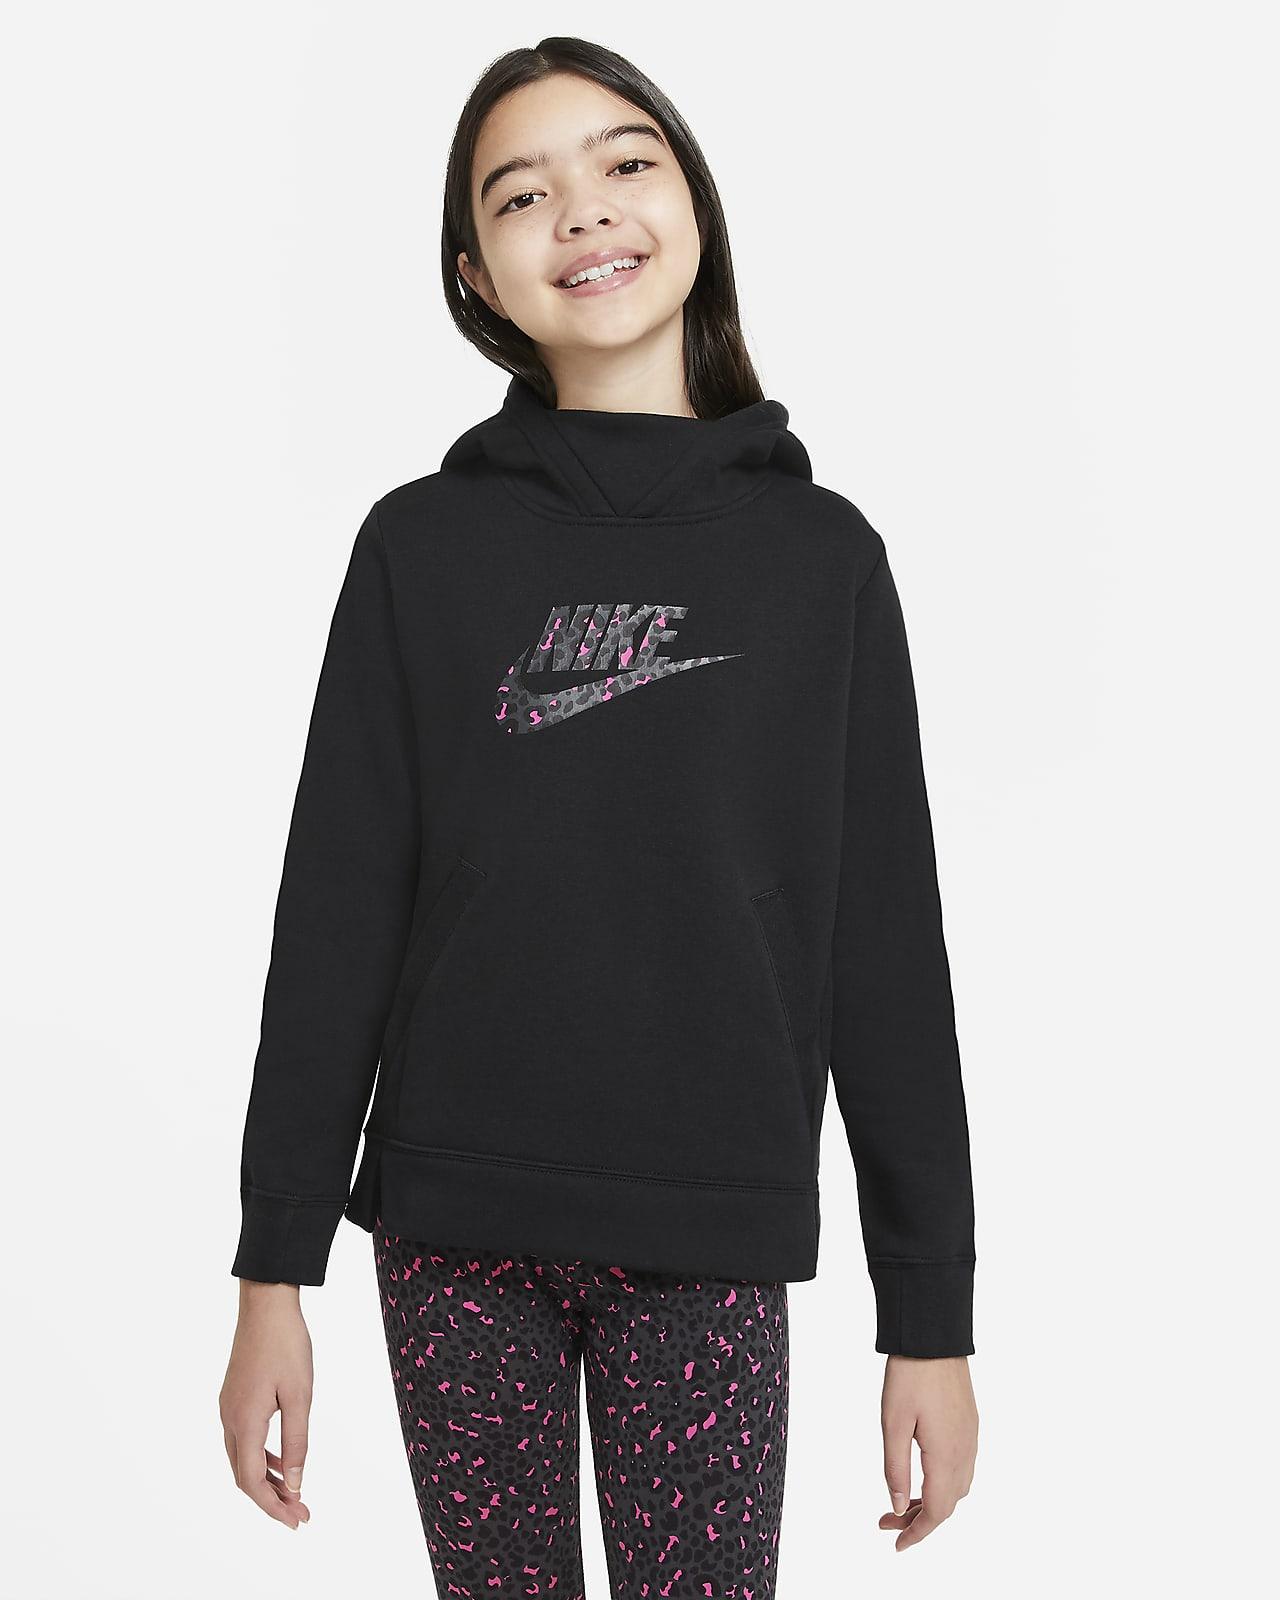 Sweat à capuche Nike Sportswear pour Fille plus âgée